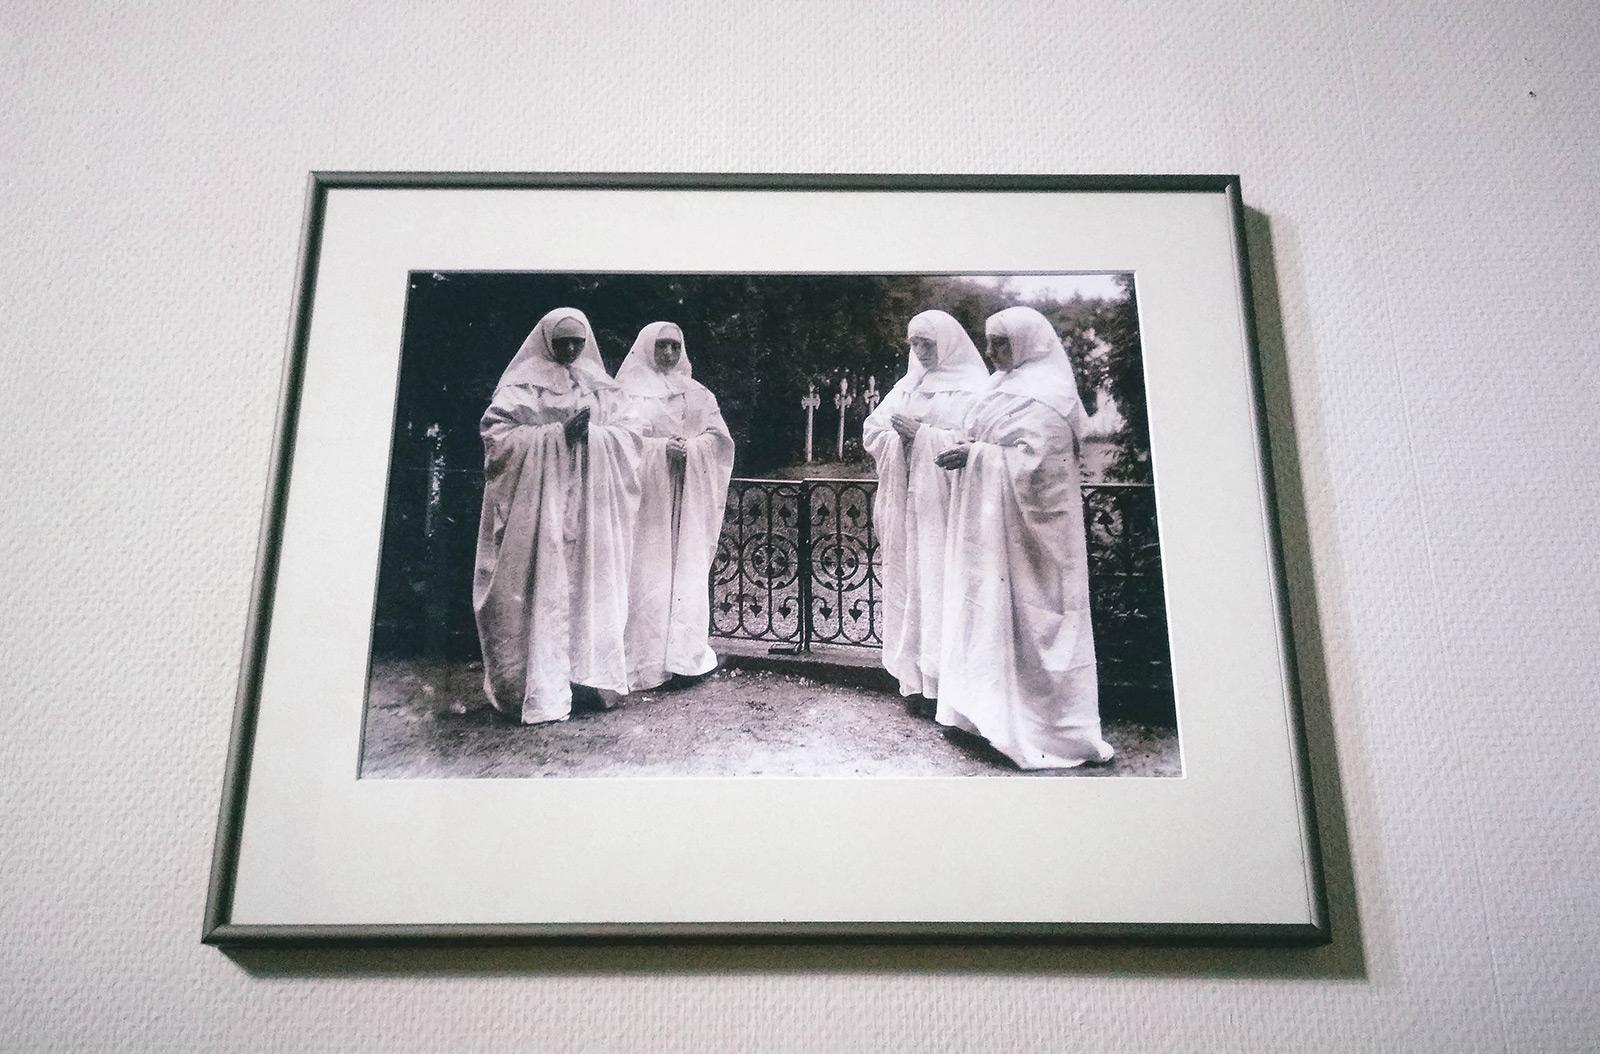 acourseindying_nijmegen_cemetery_ubbergen_refter_nuns_04-2